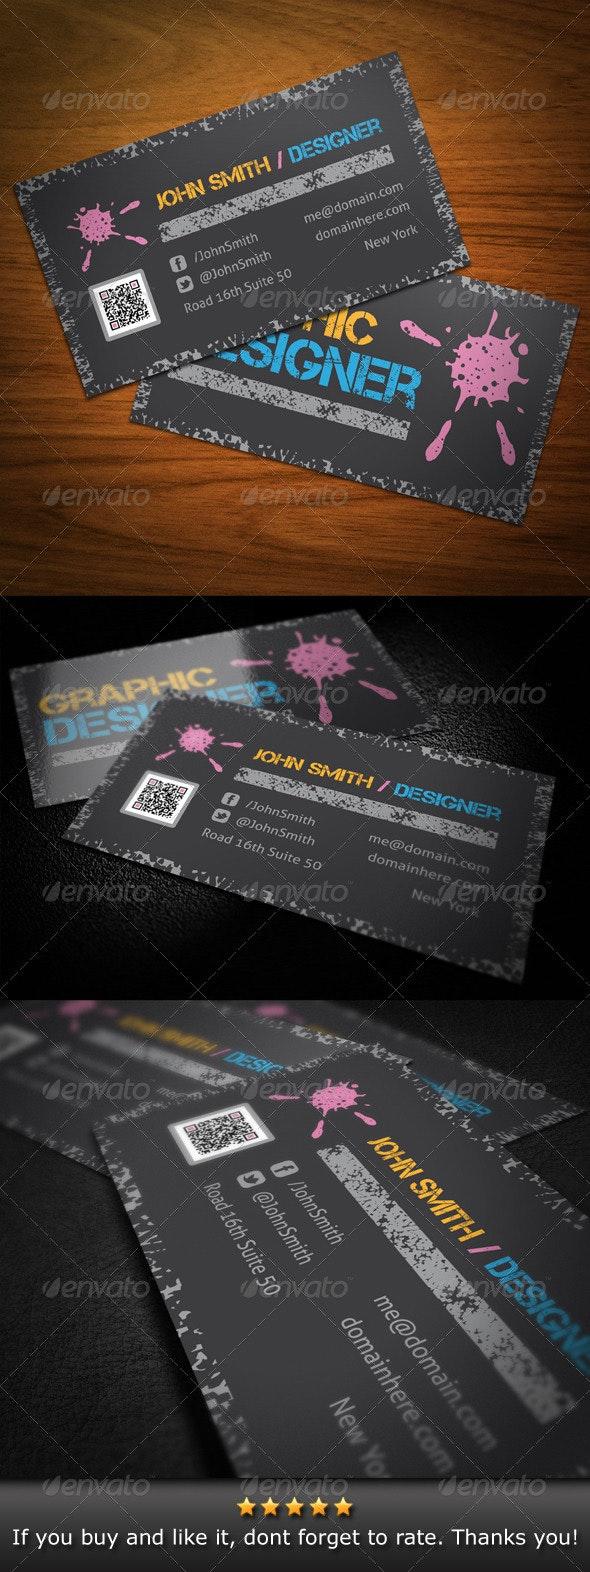 Grunge Graphic Designer Business Card - Grunge Business Cards